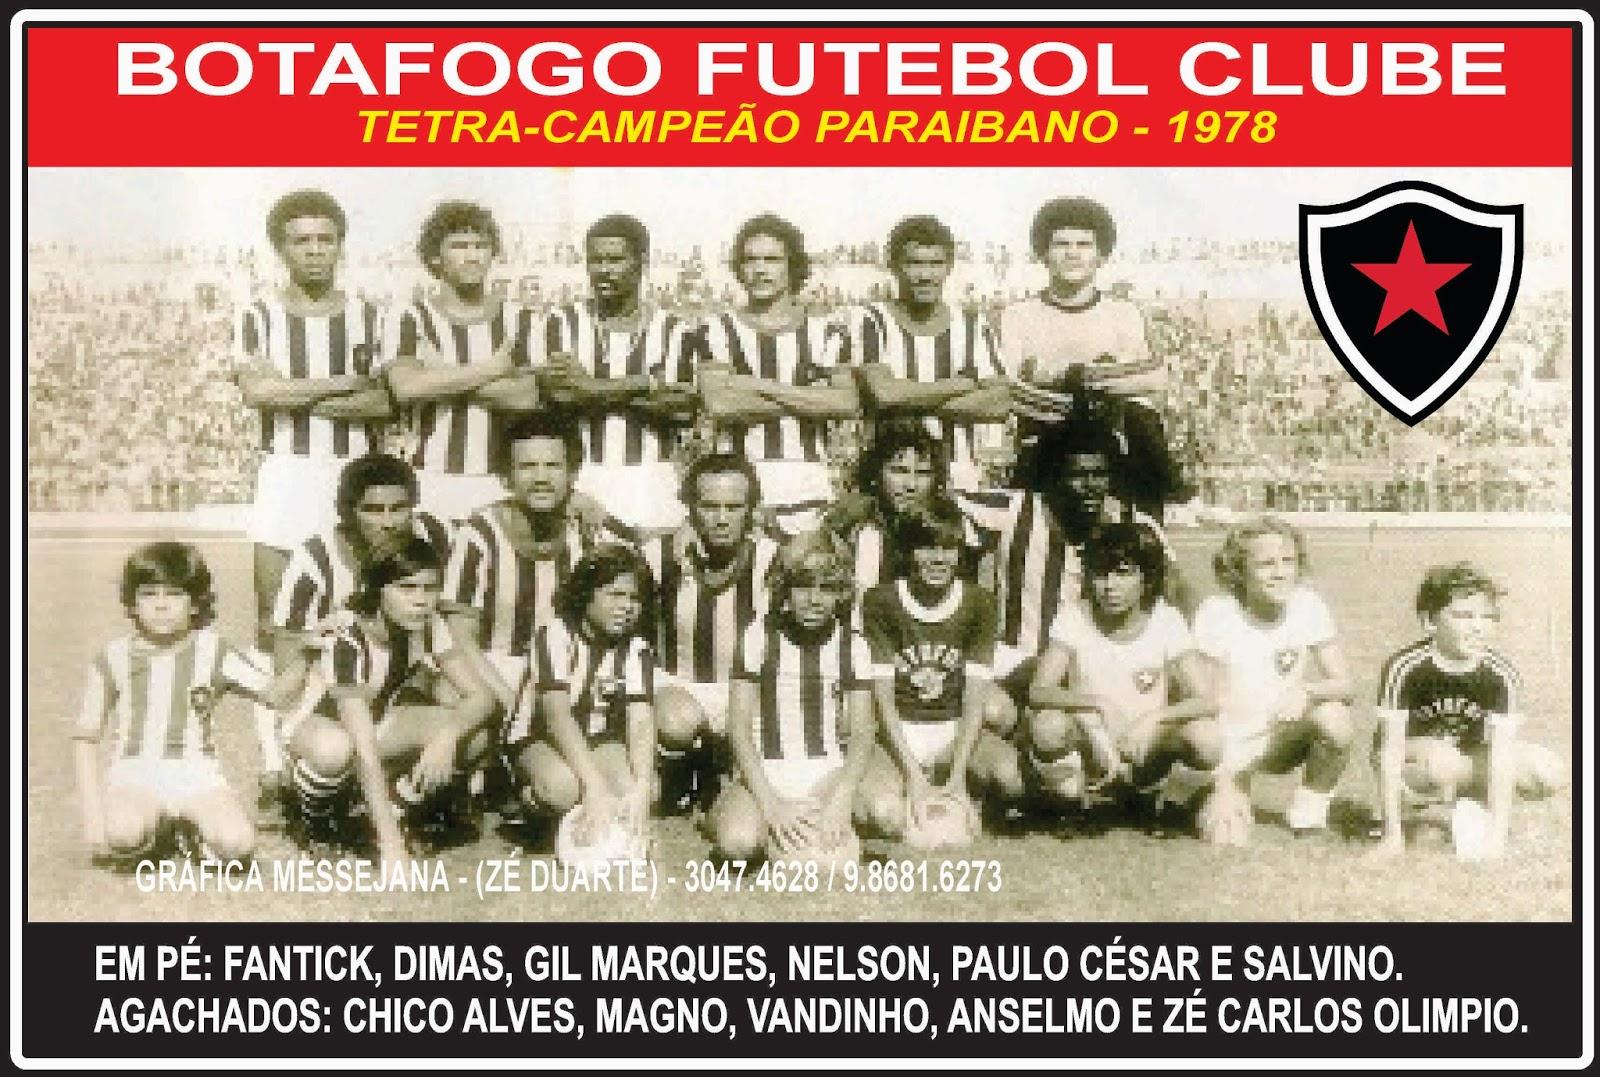 Botafogo Futebol Clube - Paraíba